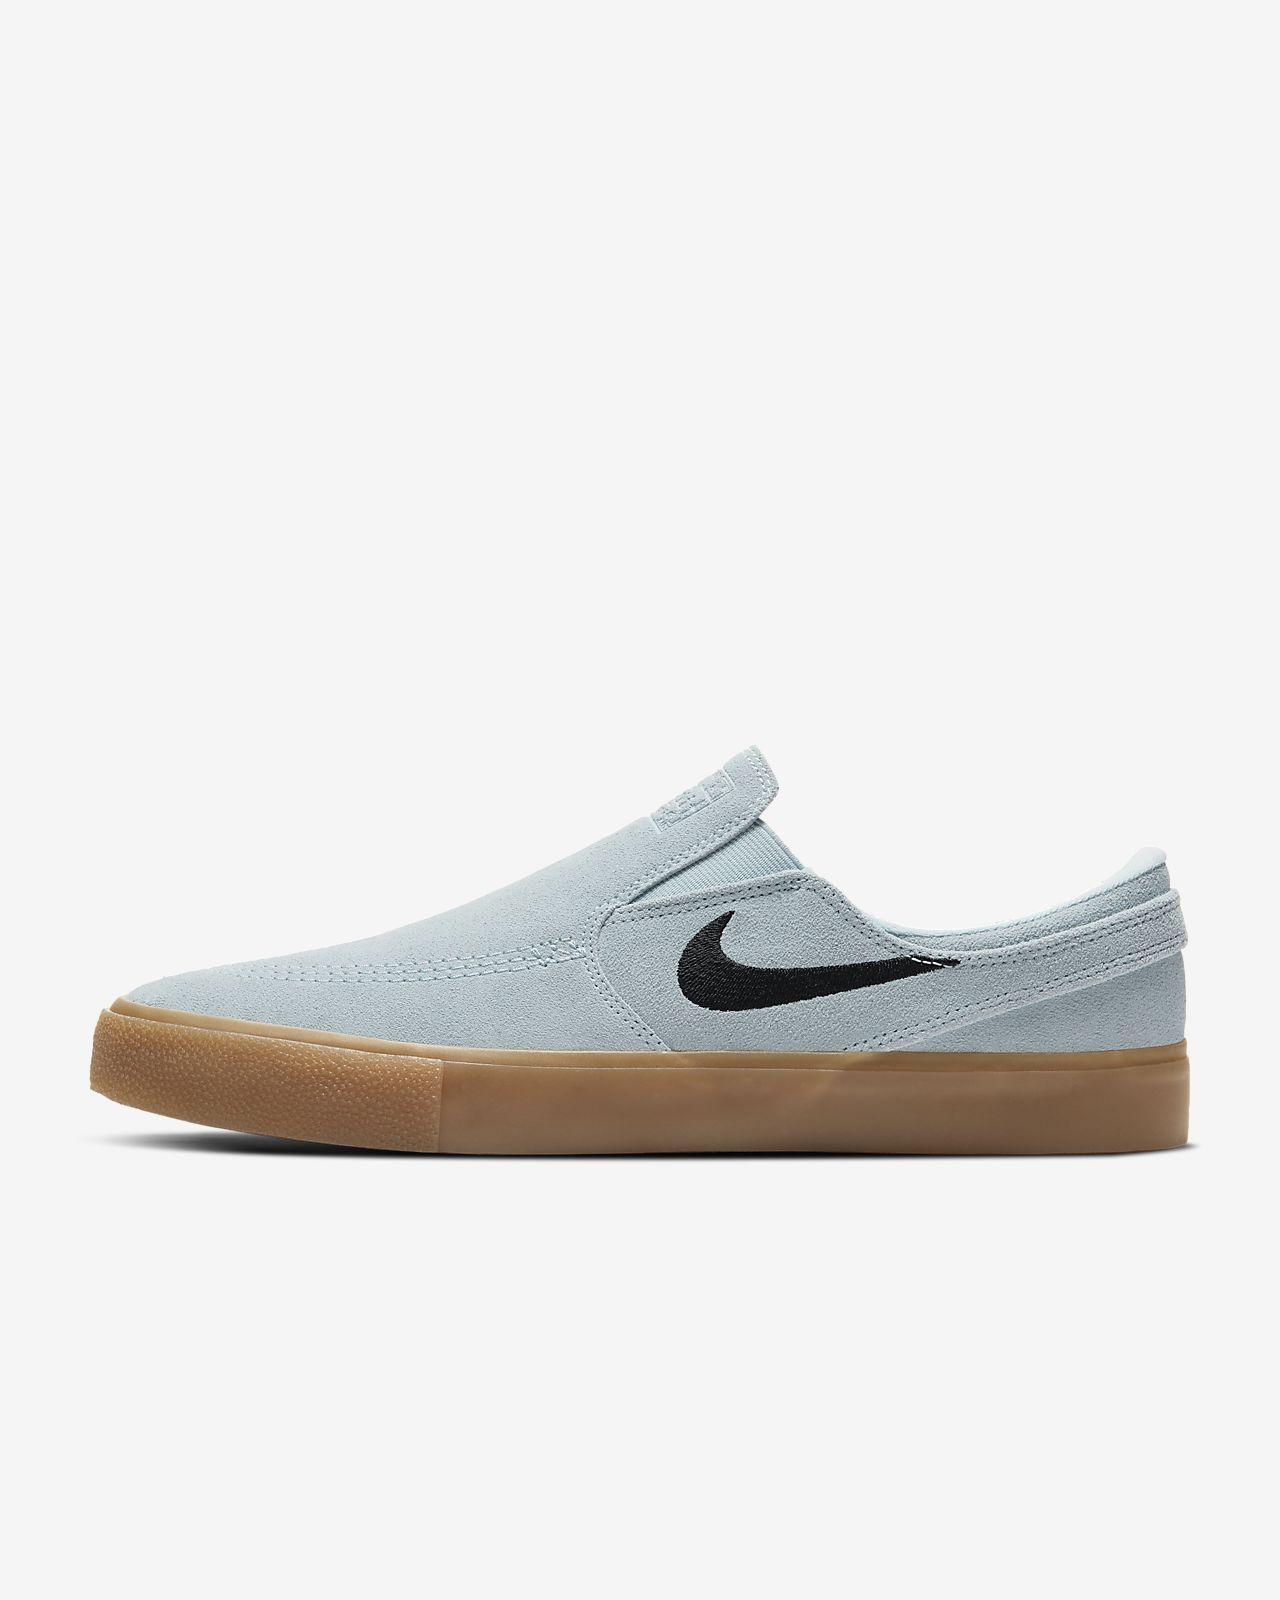 Calzado de skateboarding Nike SB Zoom Stefan Janoski Slip RM